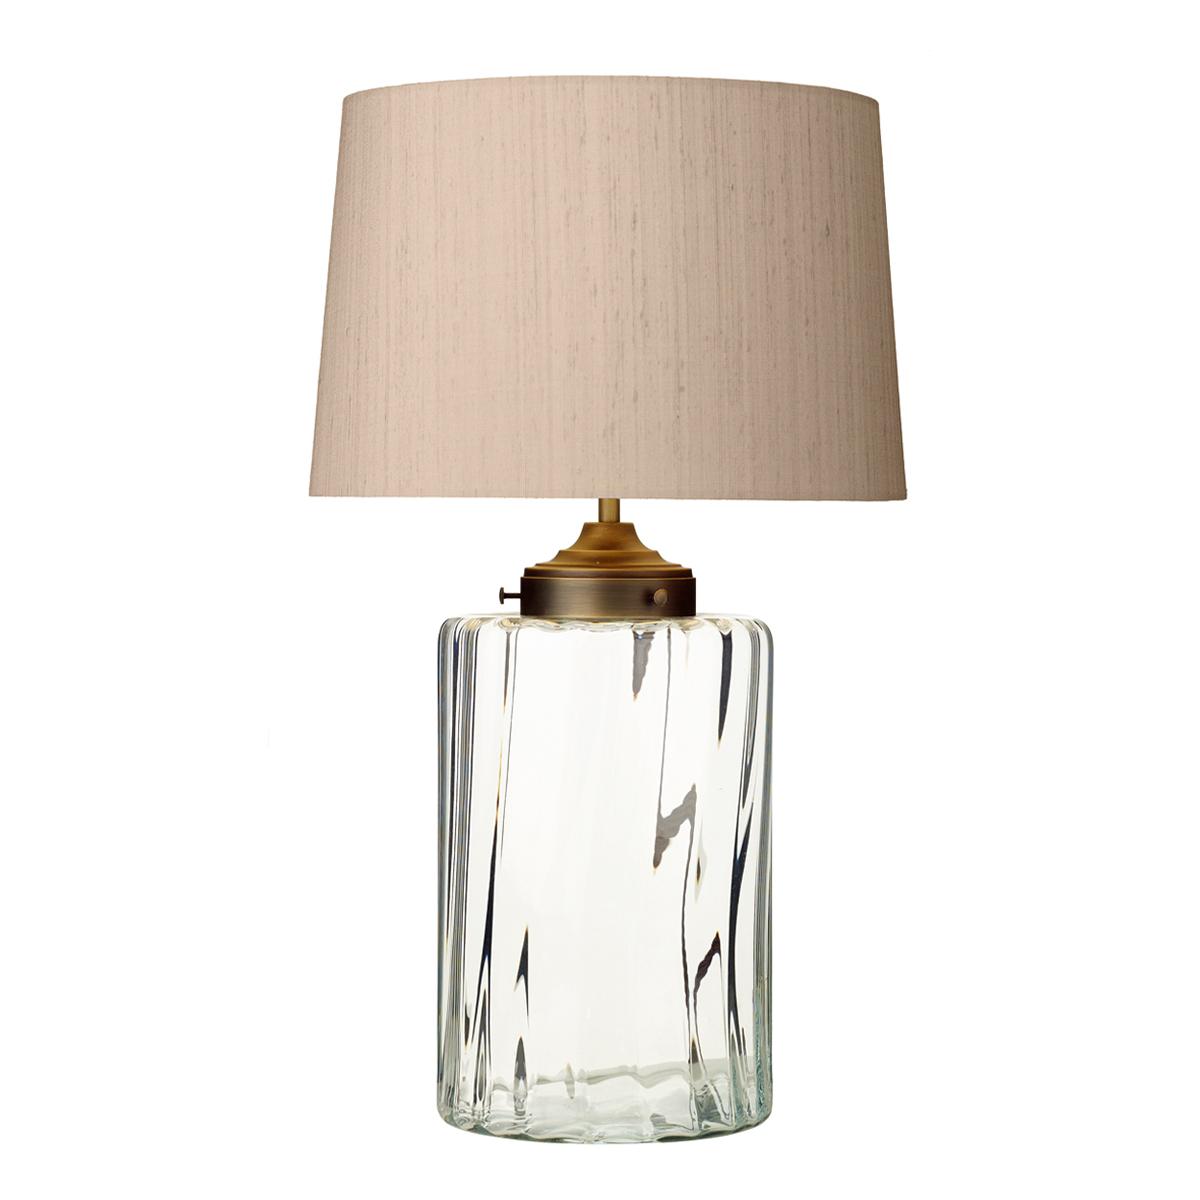 Kew Table Lamp Clear Glass Base Only Nottingham Lighting Centre